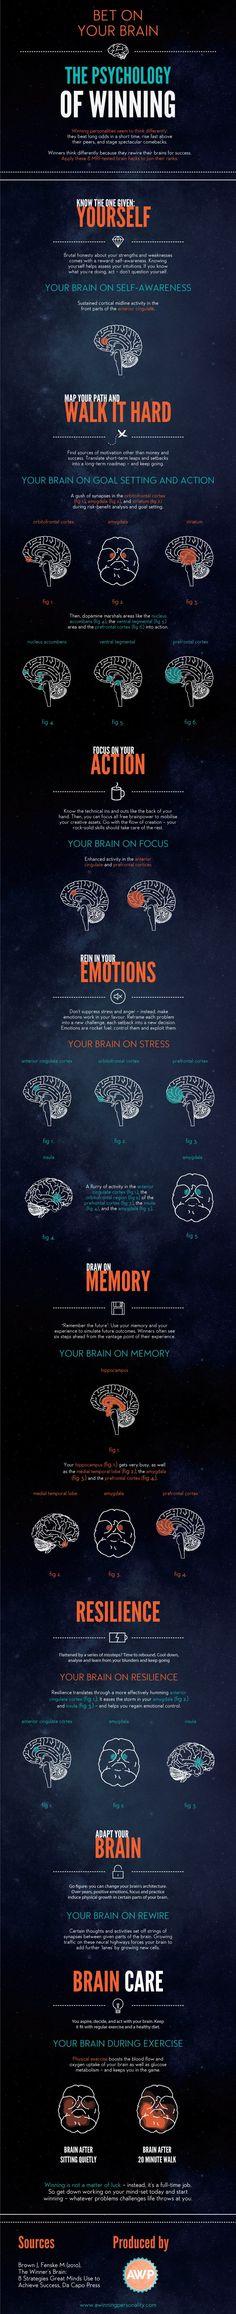 The psychology of winning. (More design inspiration at www.aldenchong.com)